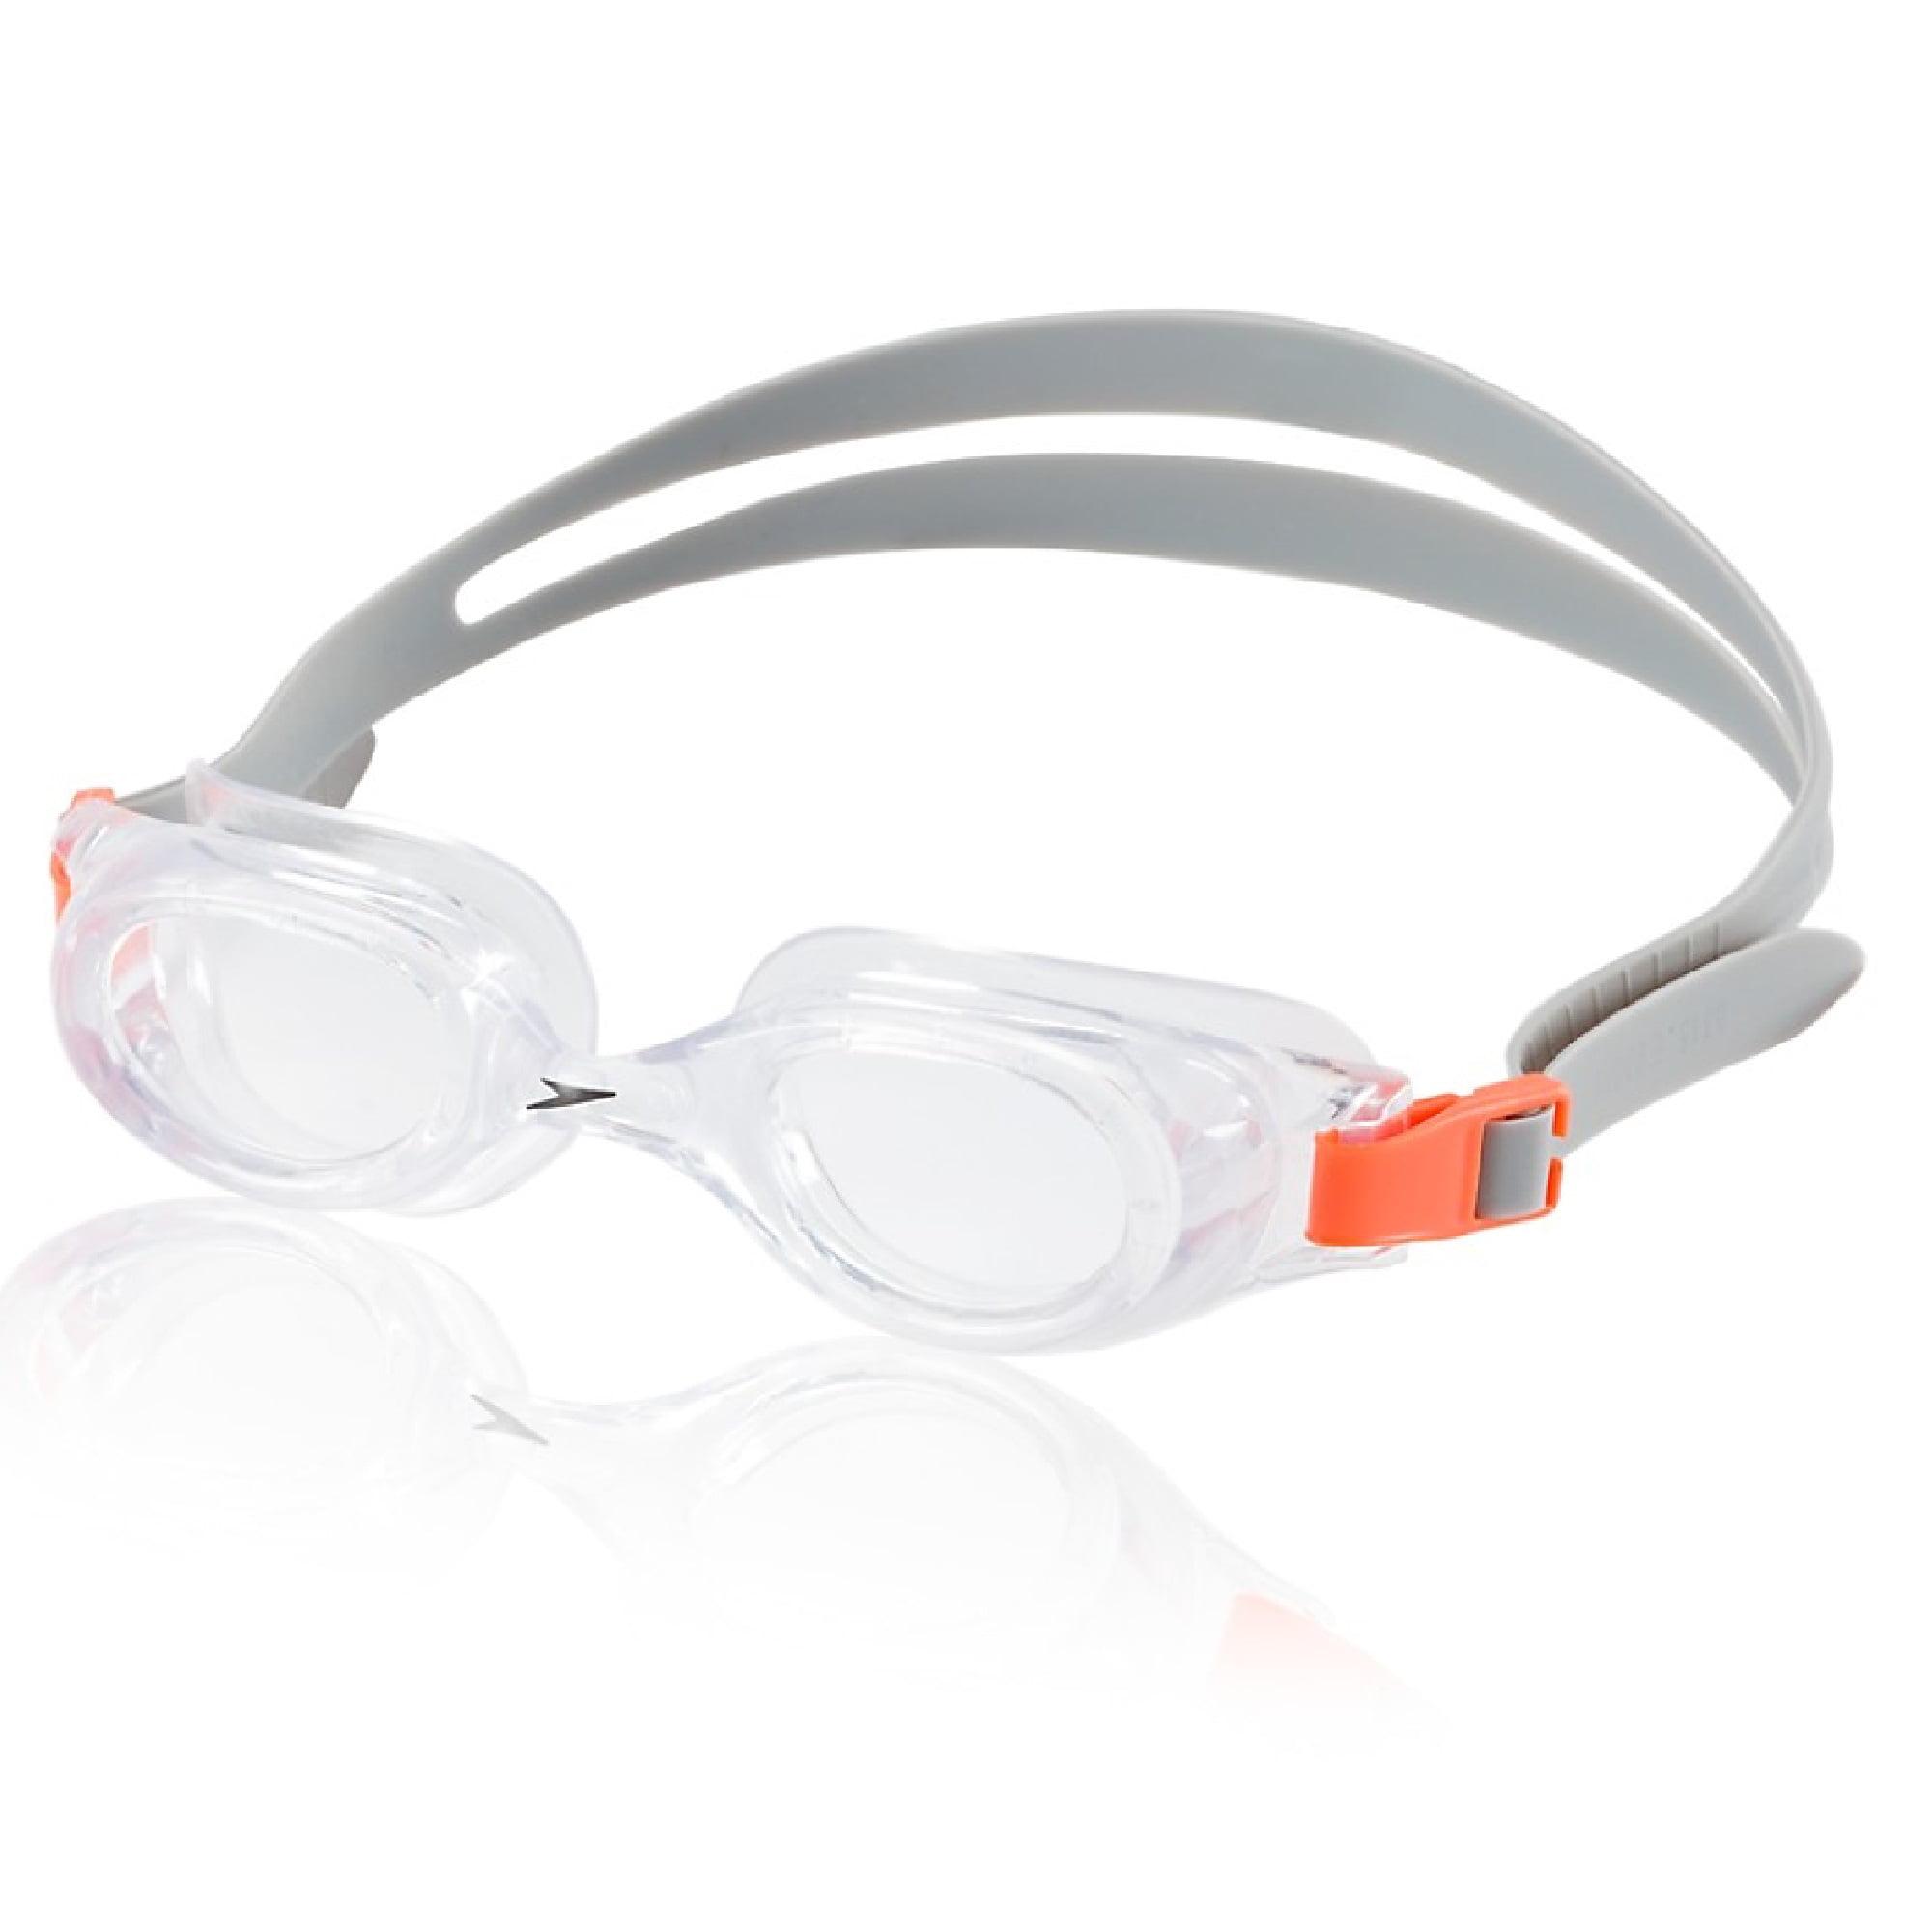 Speedo Jr. Hydrospex Classic Swim Swimming Anti-Fog Goggles, Silver Ice One Size by Speedo